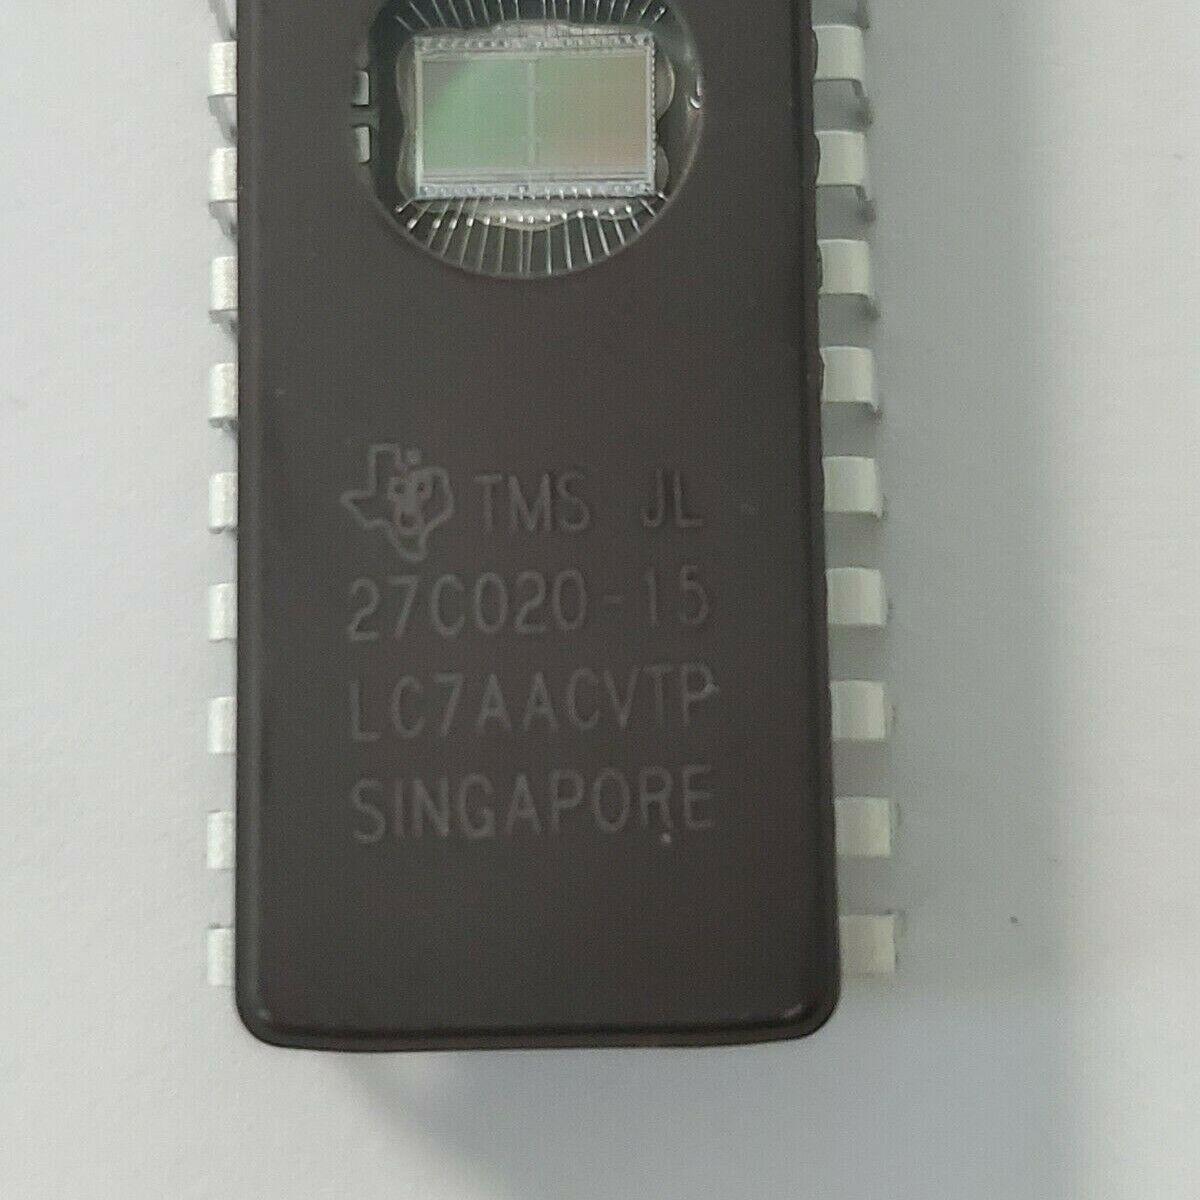 Eprom TMS27C020-15JL Texas Instruments WDIP32 35,00 € UV 11 Stück